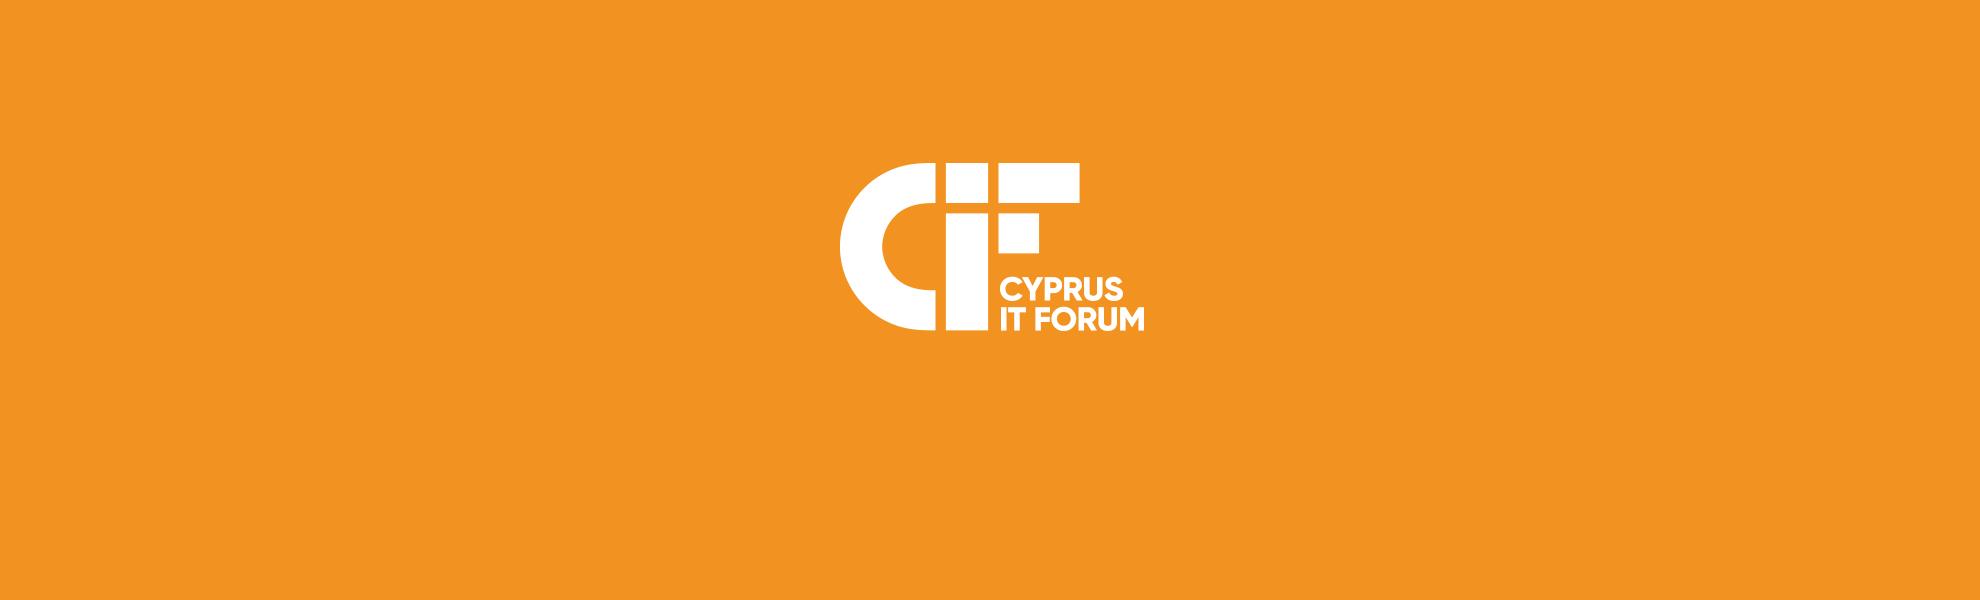 Cyprus IT Forum 2019